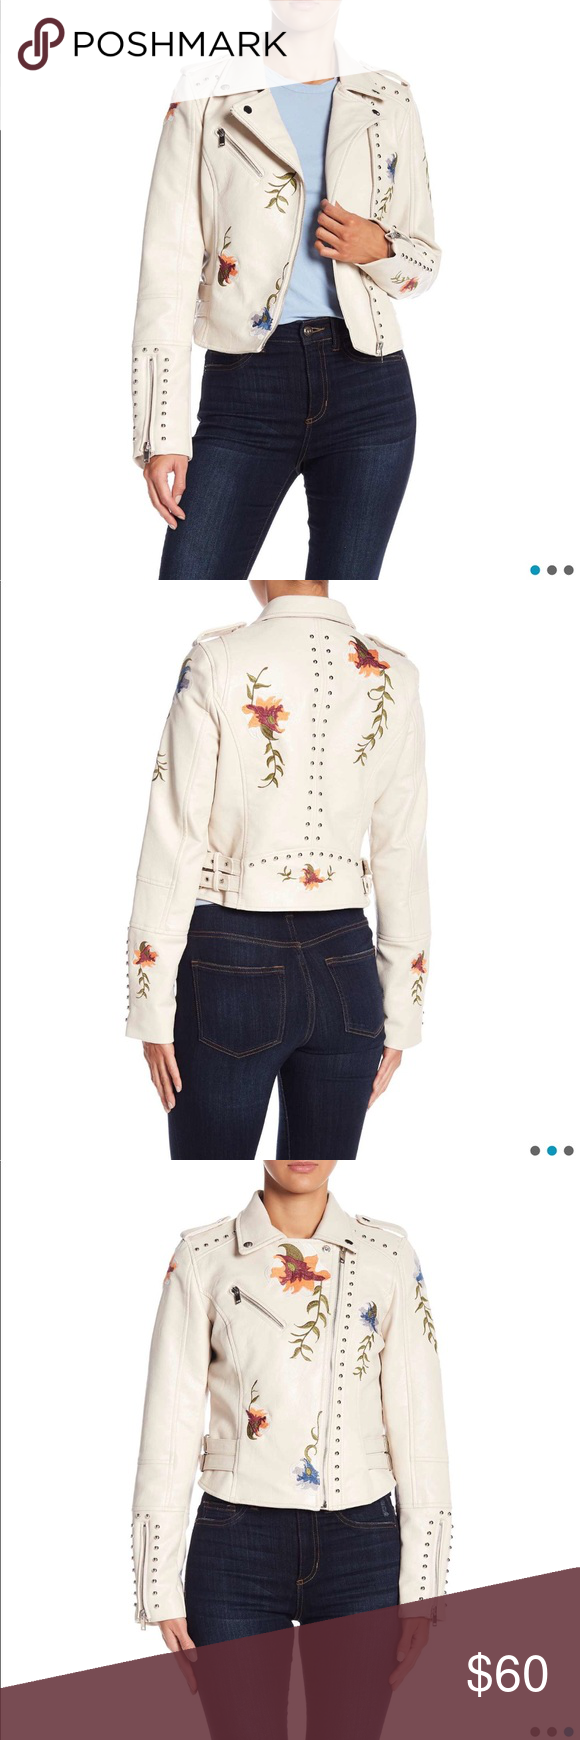 Faux Leather Off White Moto Flora Jacket Flora jackets